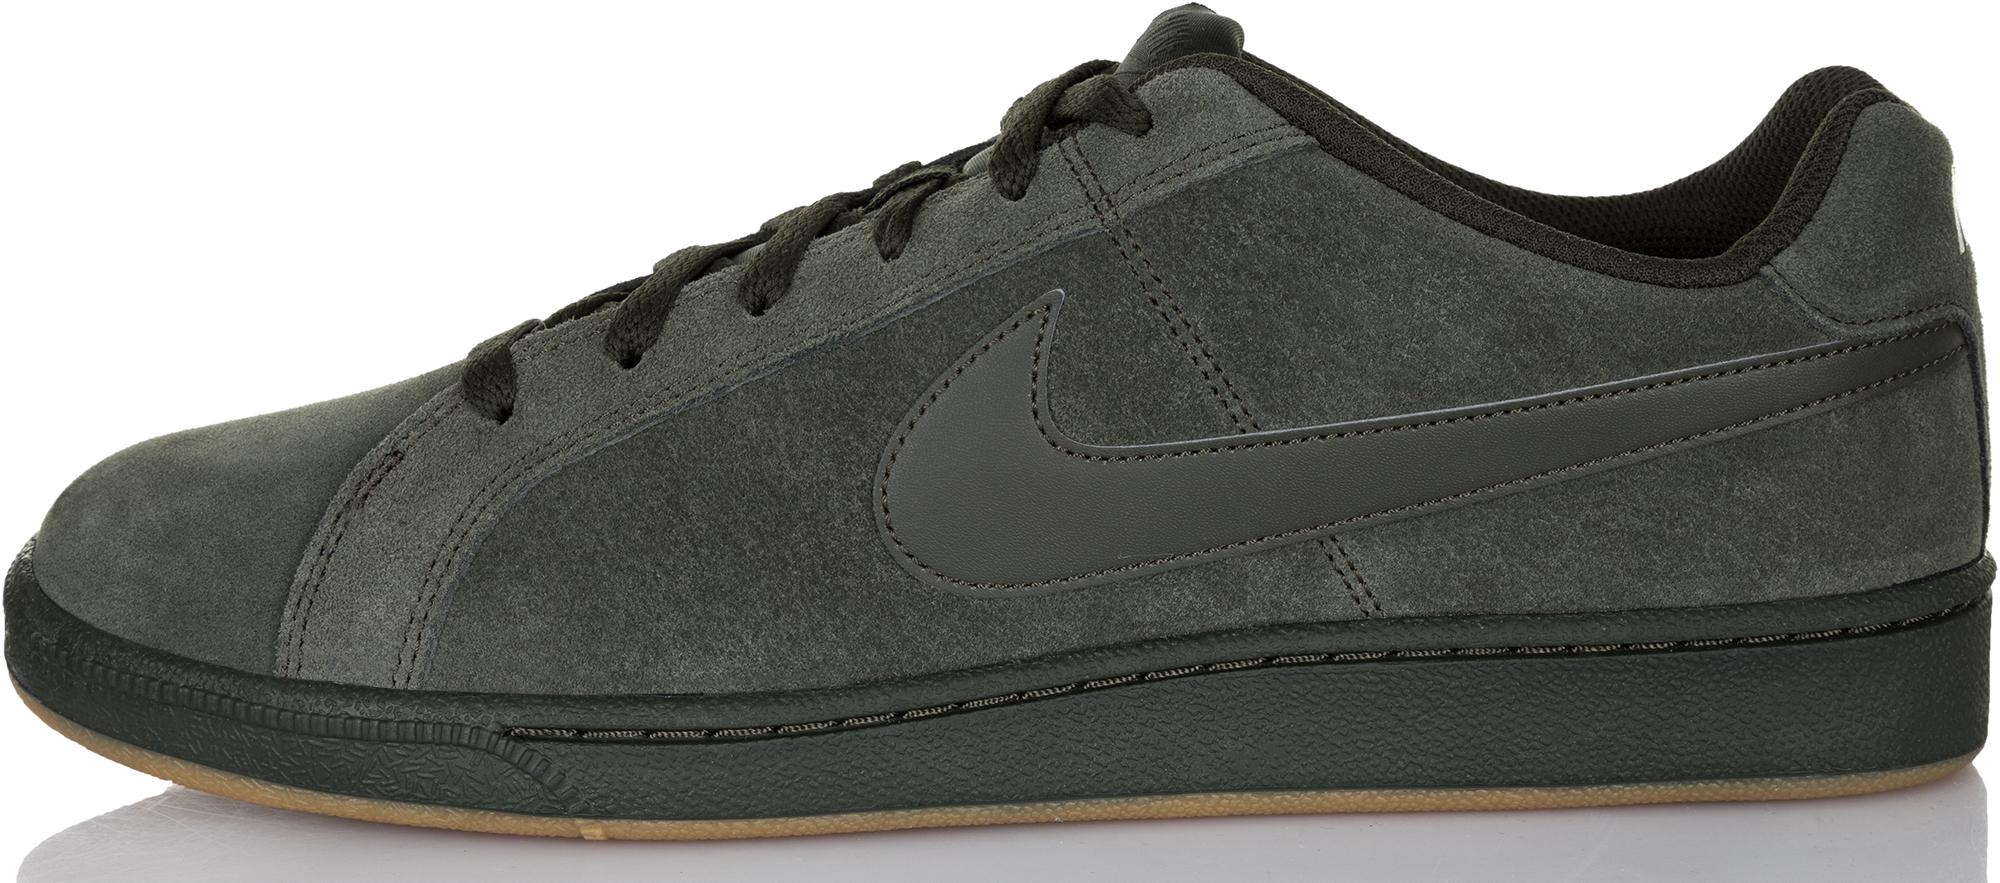 Nike Кеды мужские Nike Court Royale, размер 46,5 кроссовки для тенниса мужские nike court lite цвет белый 845021 100 размер 10 5 43 5